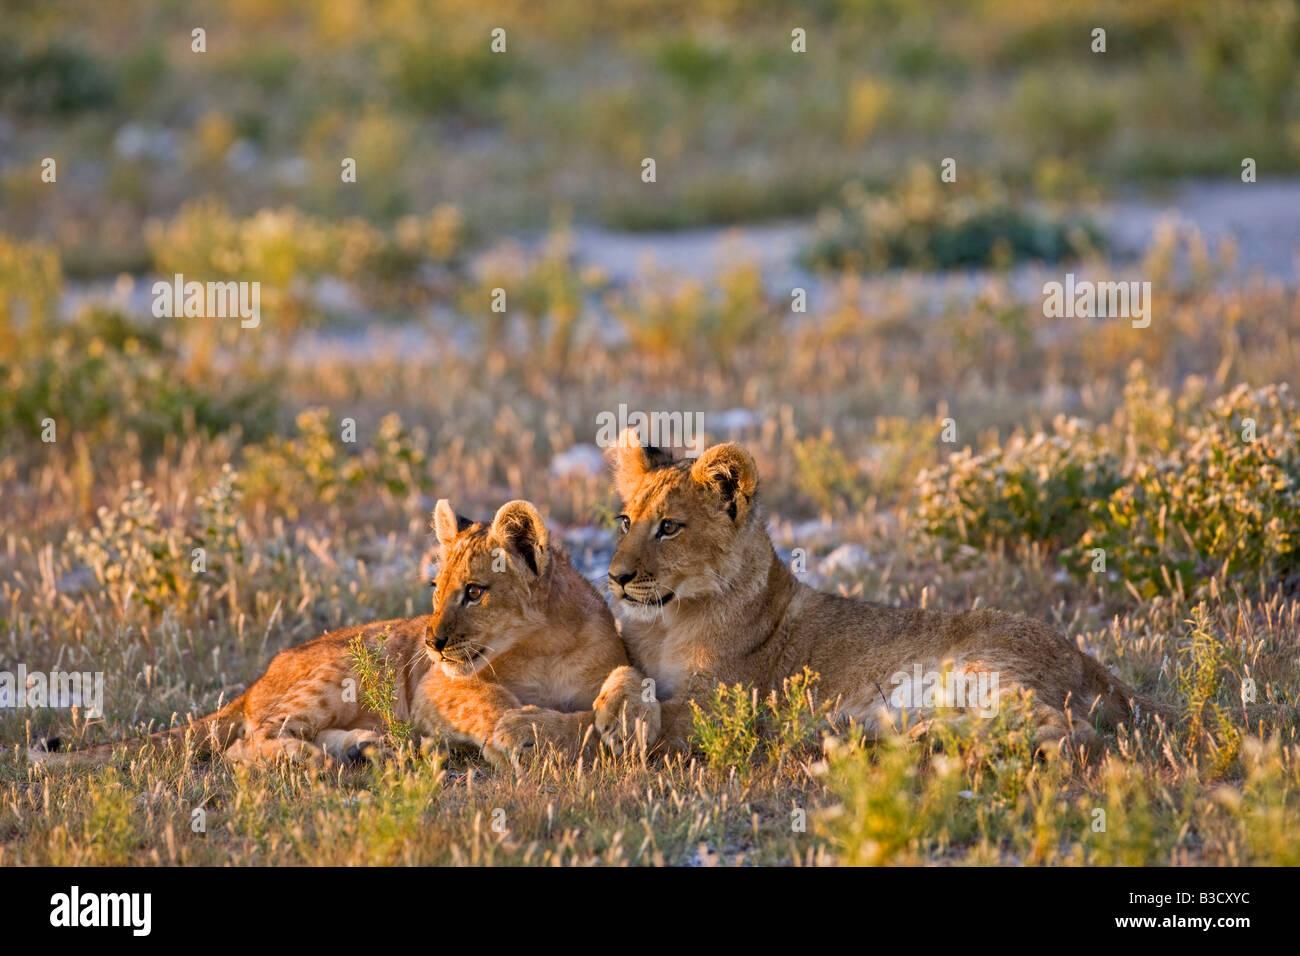 Africa, Botswana, Lion cubs (Panthera leo) - Stock Image